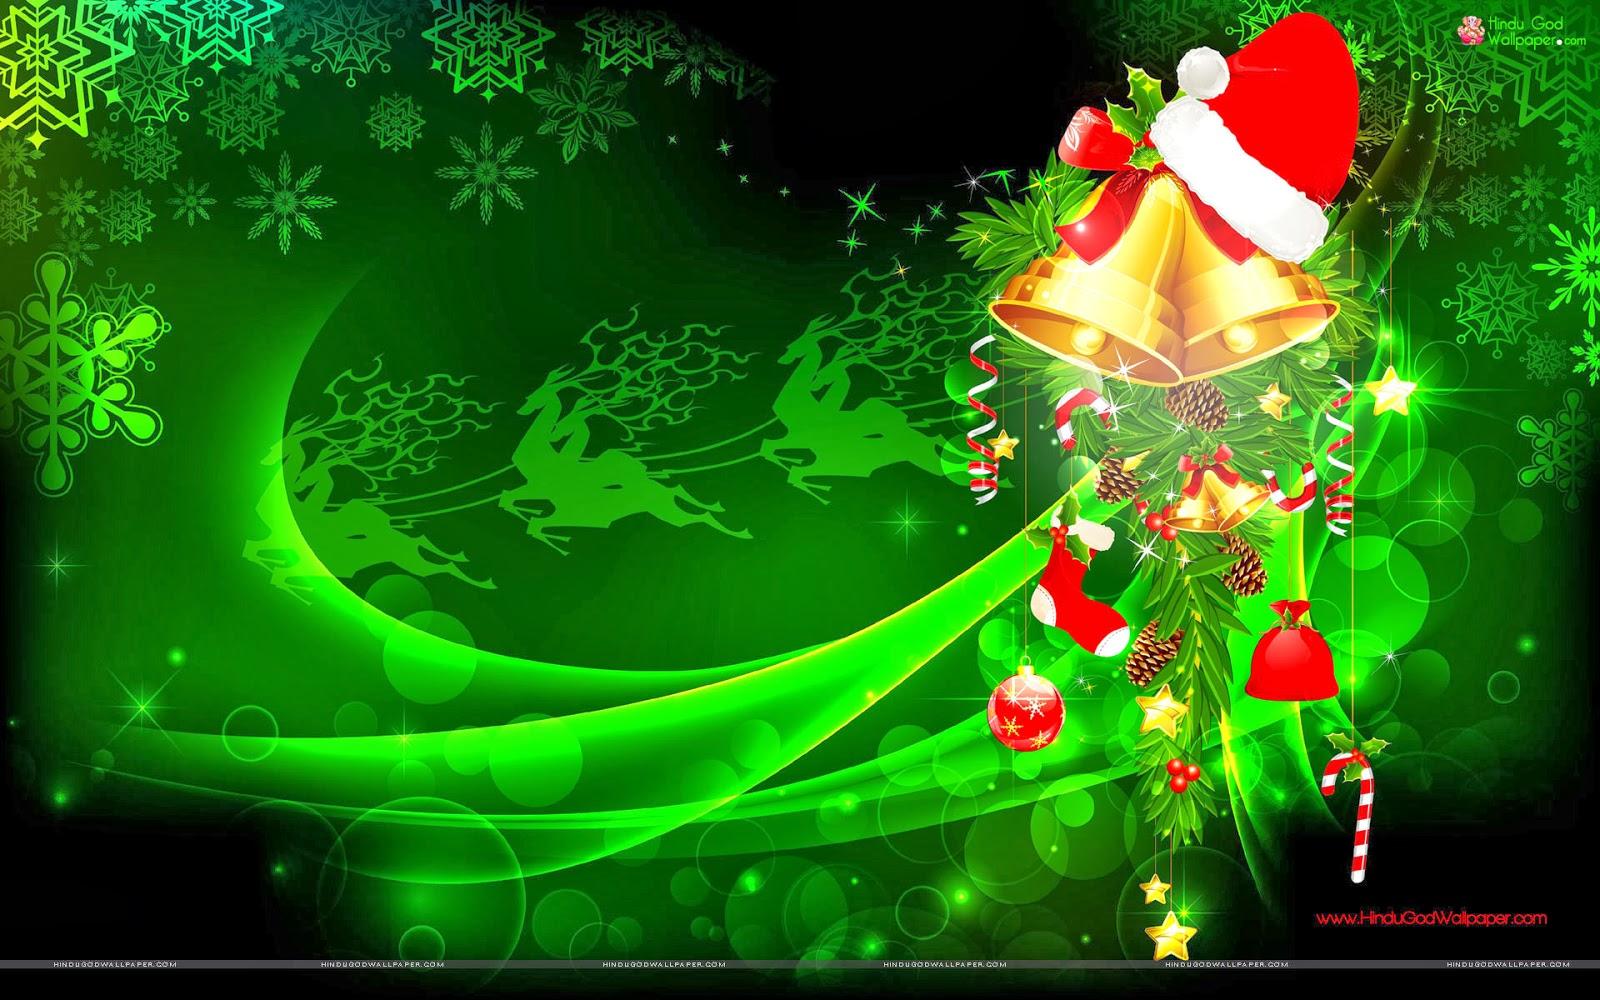 Christmas hindu god wallpapers download - Christmas wallpaper hd for desktop ...